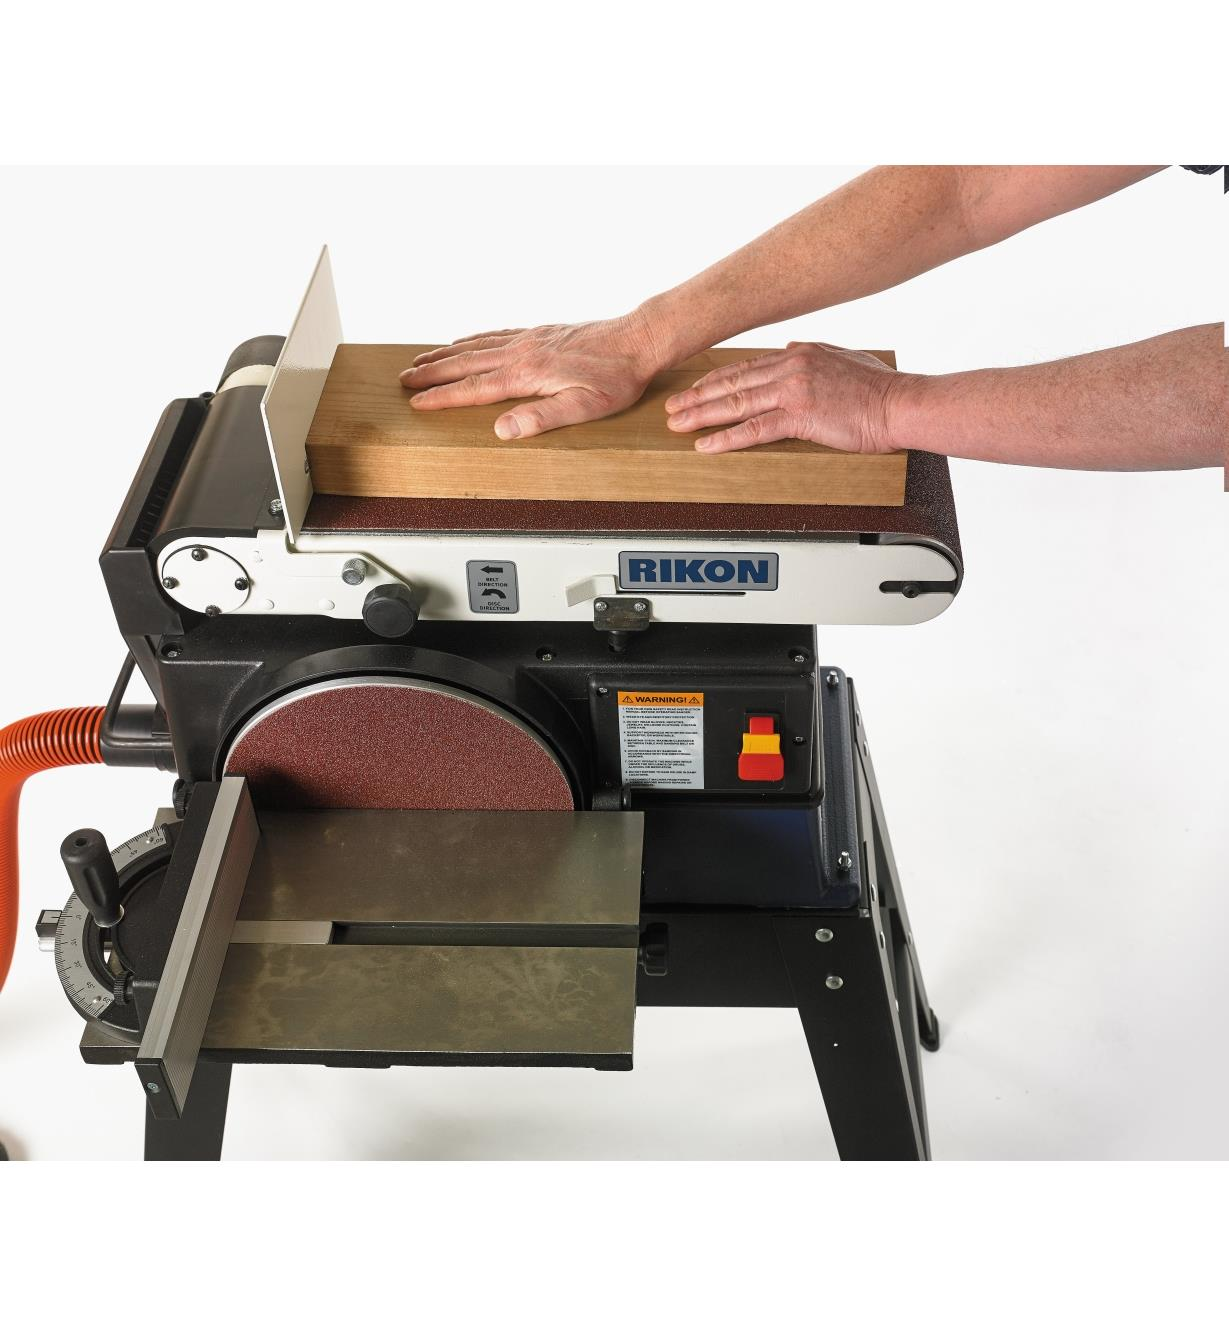 Rikon Combination Belt Disc Sander Lee Valley Tools